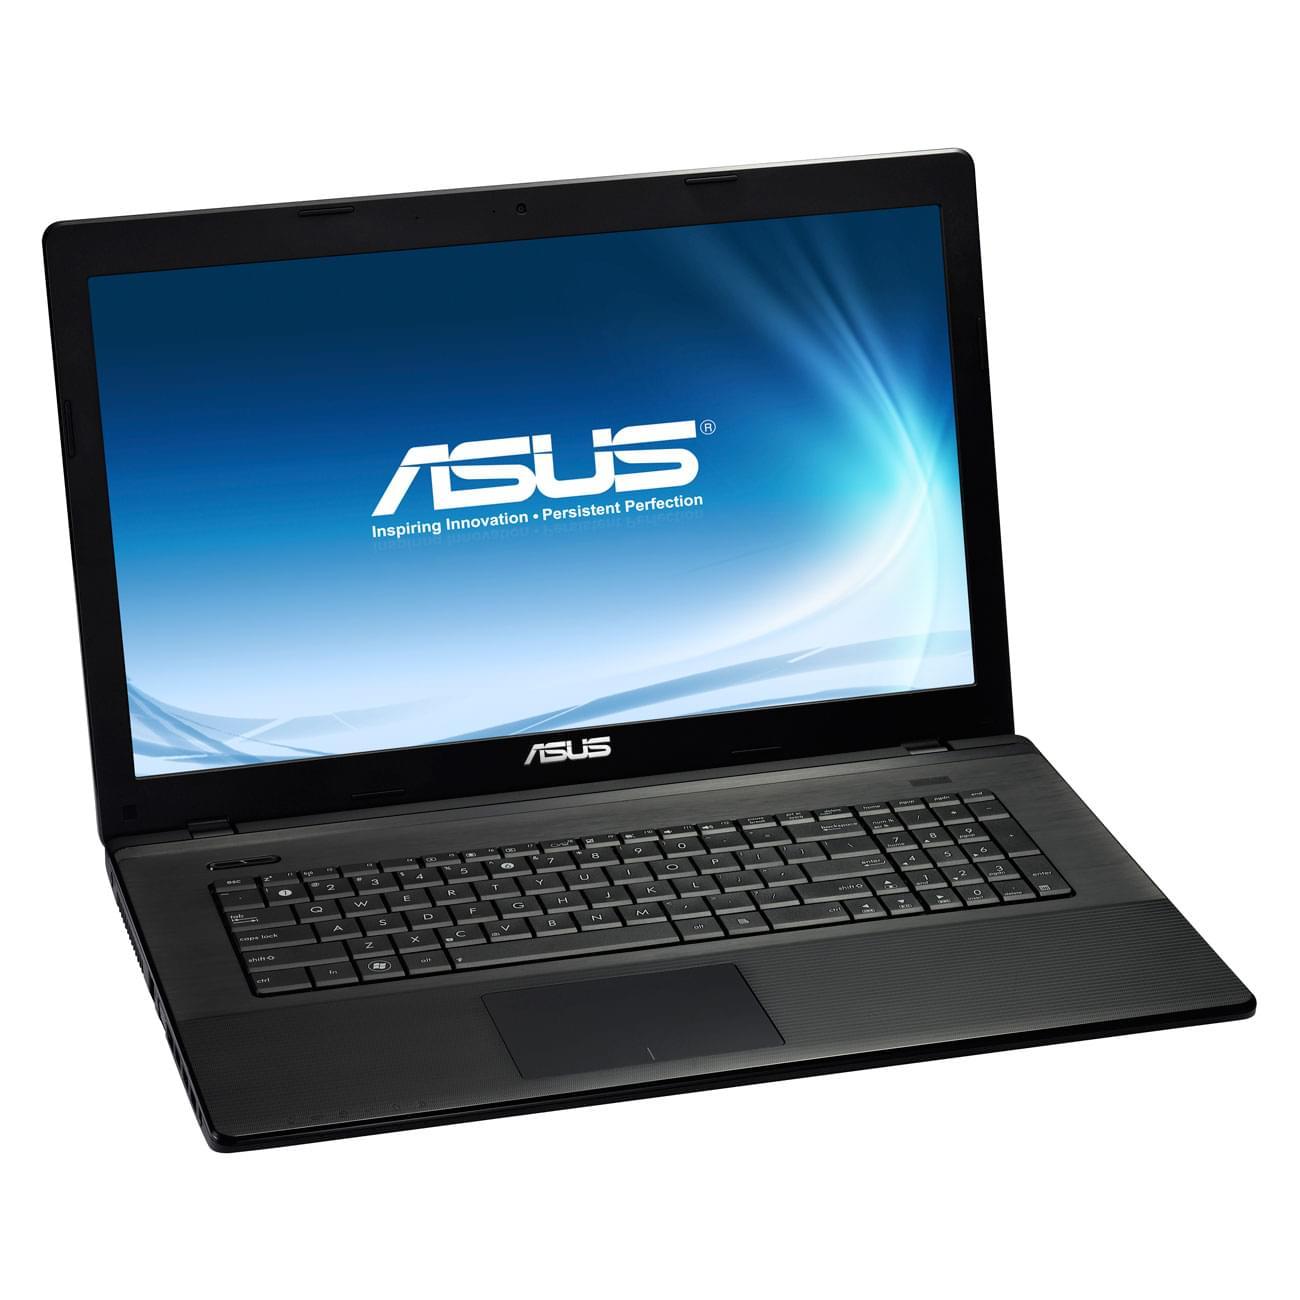 Asus X75VD-TY082V - PC portable Asus - Cybertek.fr - 0